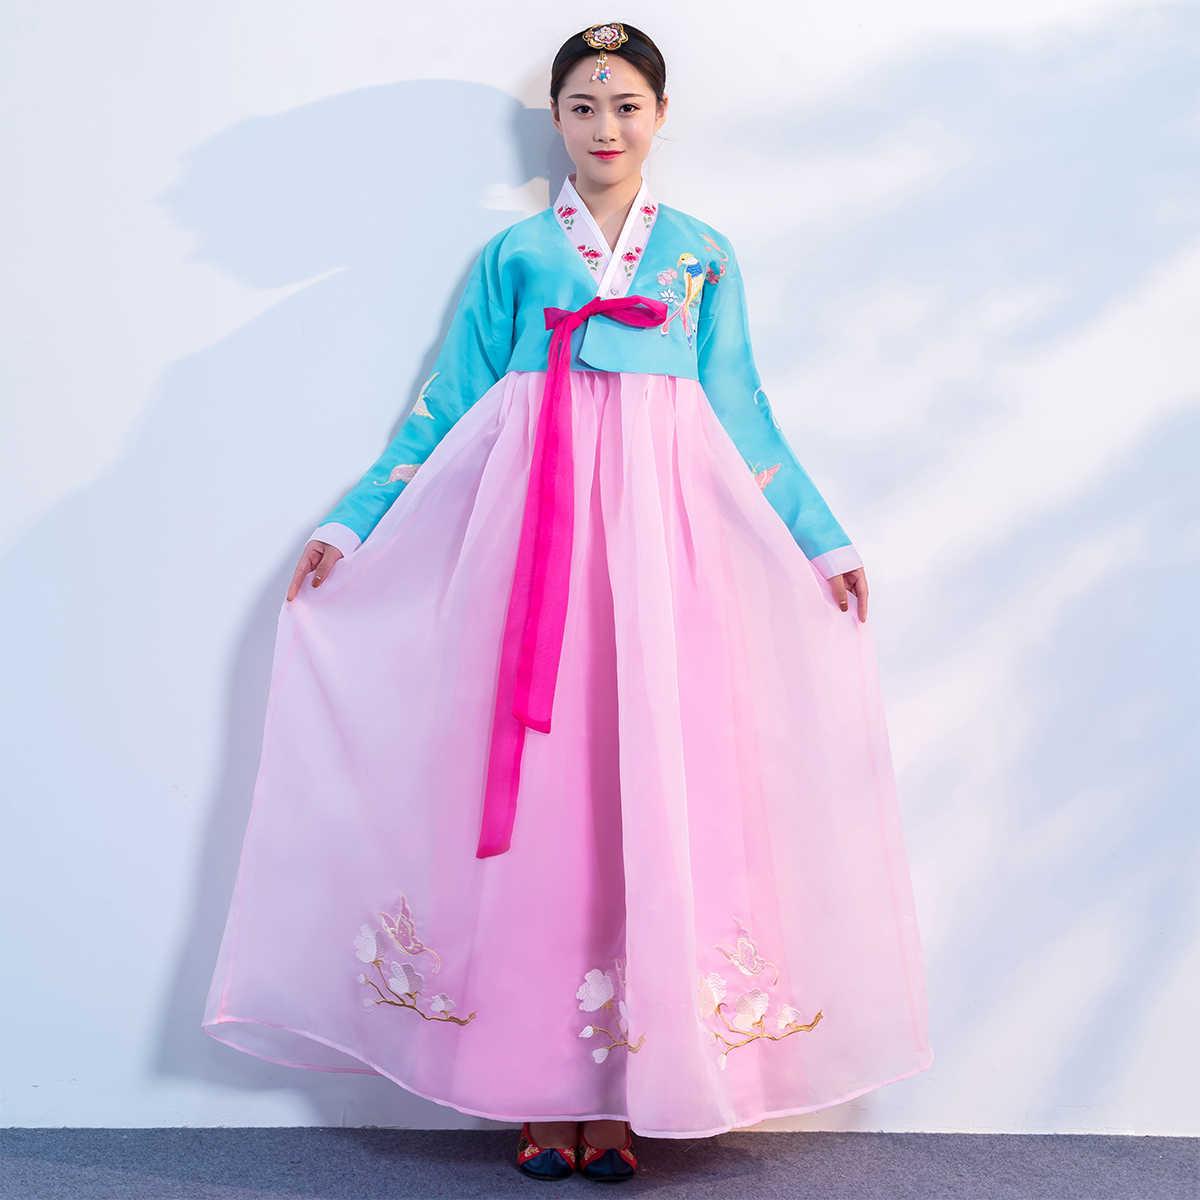 304f3a8de ... Korean Hanbok Costume Traditional Wedding Palace Hanbok for Women  Vintage South Korean Minority Dance Costumes Ancient ...